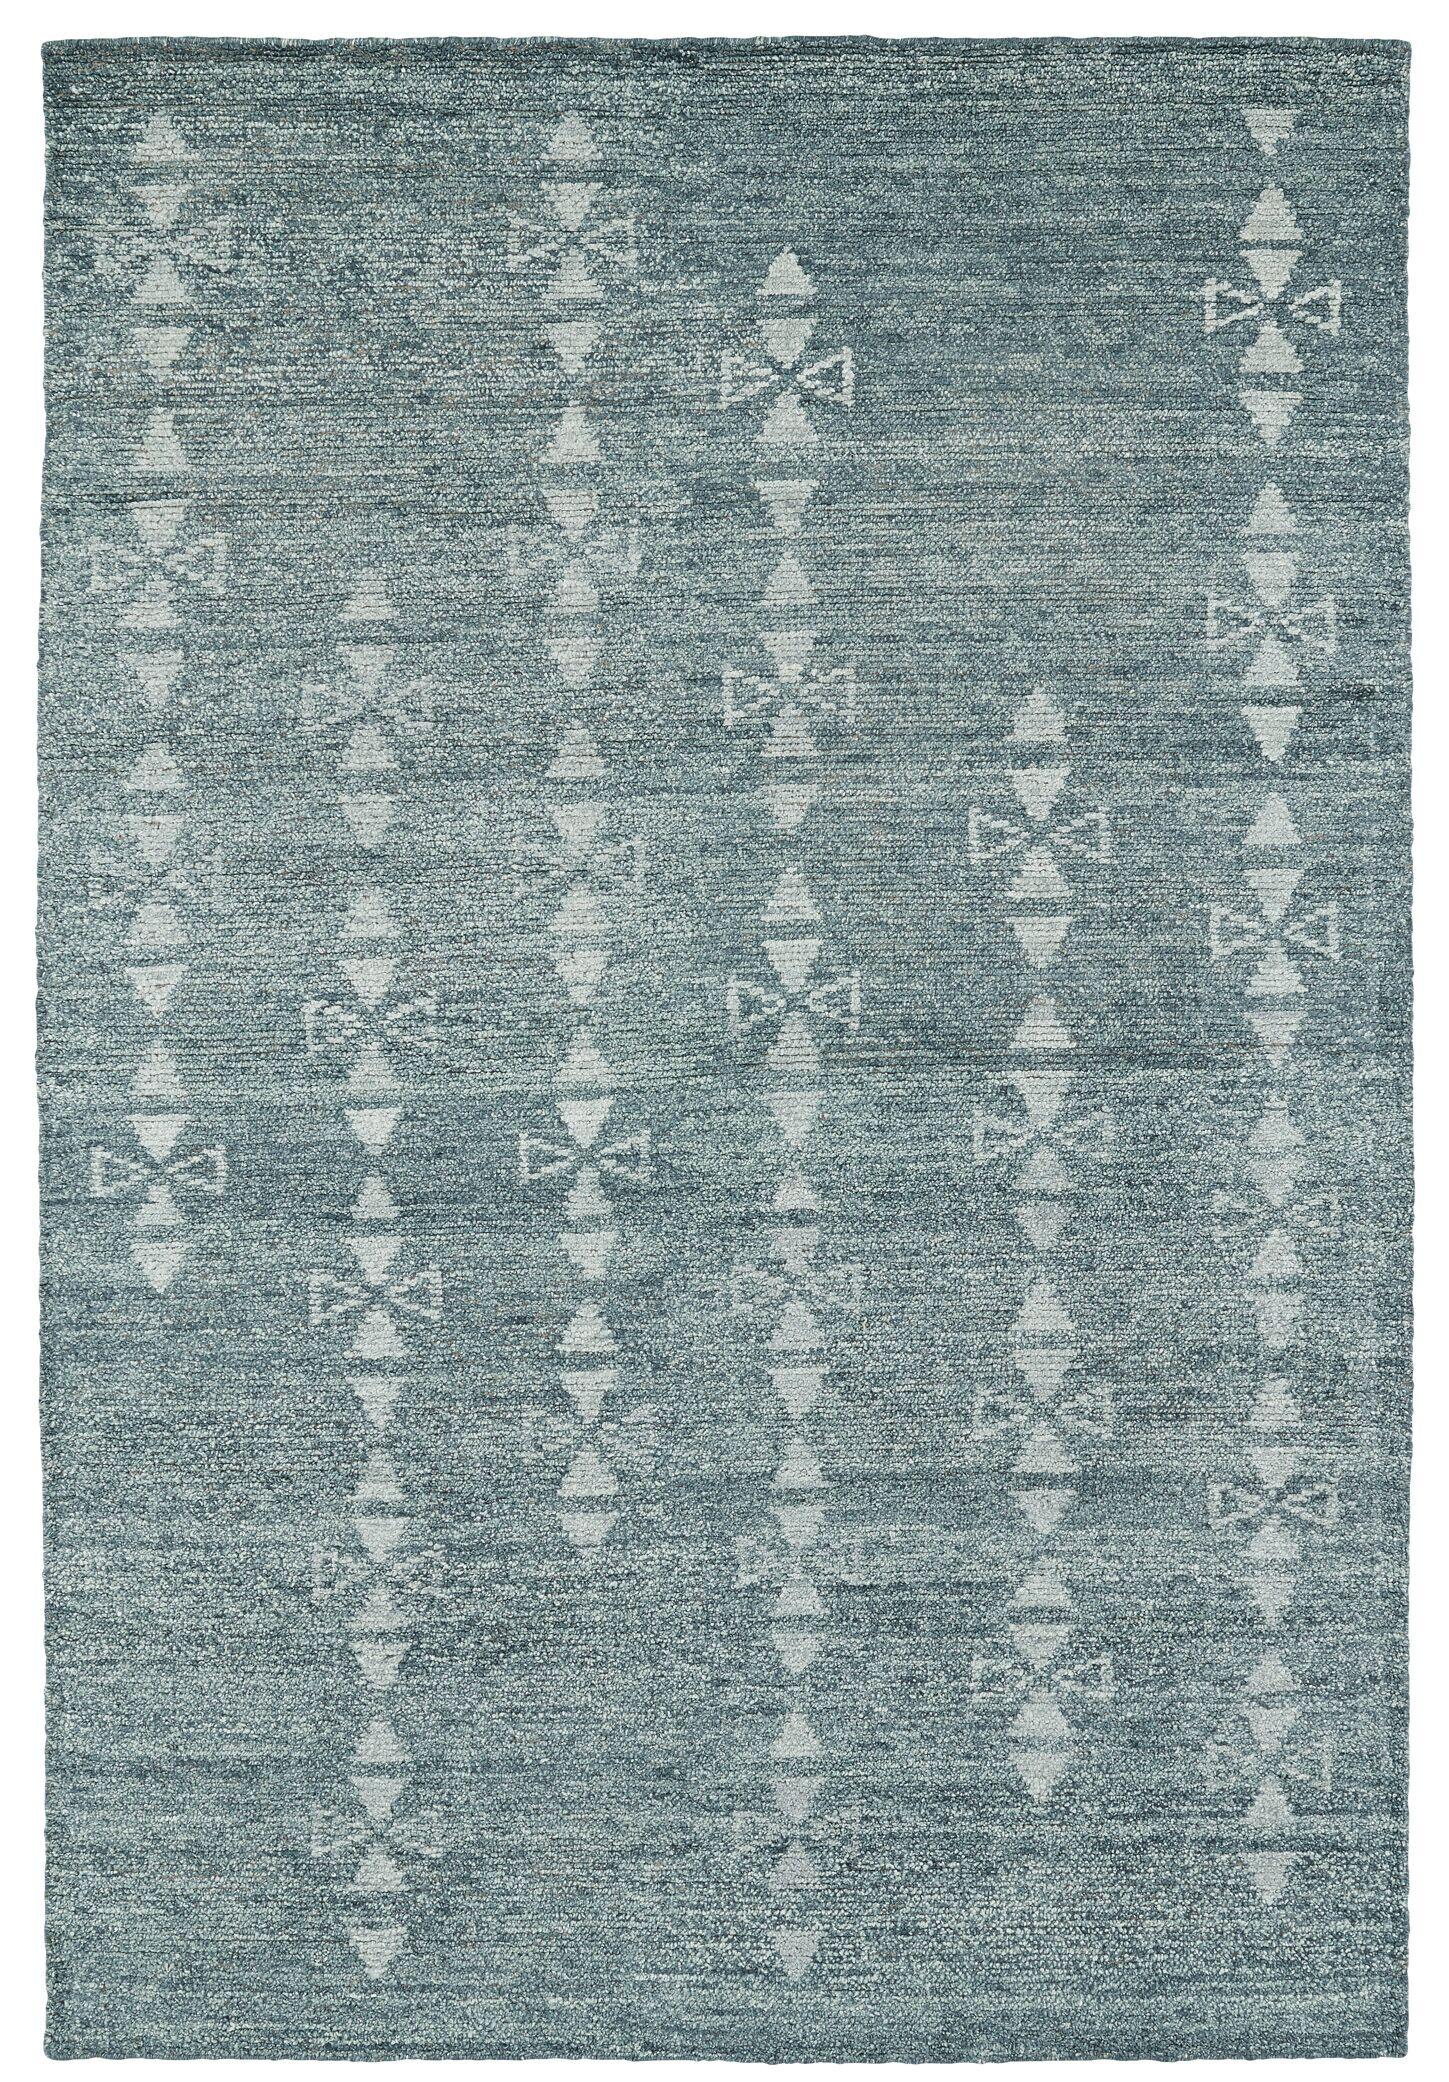 Aracely Hand Woven Ice Blue/Light Blue Area Rug Rug Size: Rectangle 5' x 7'9